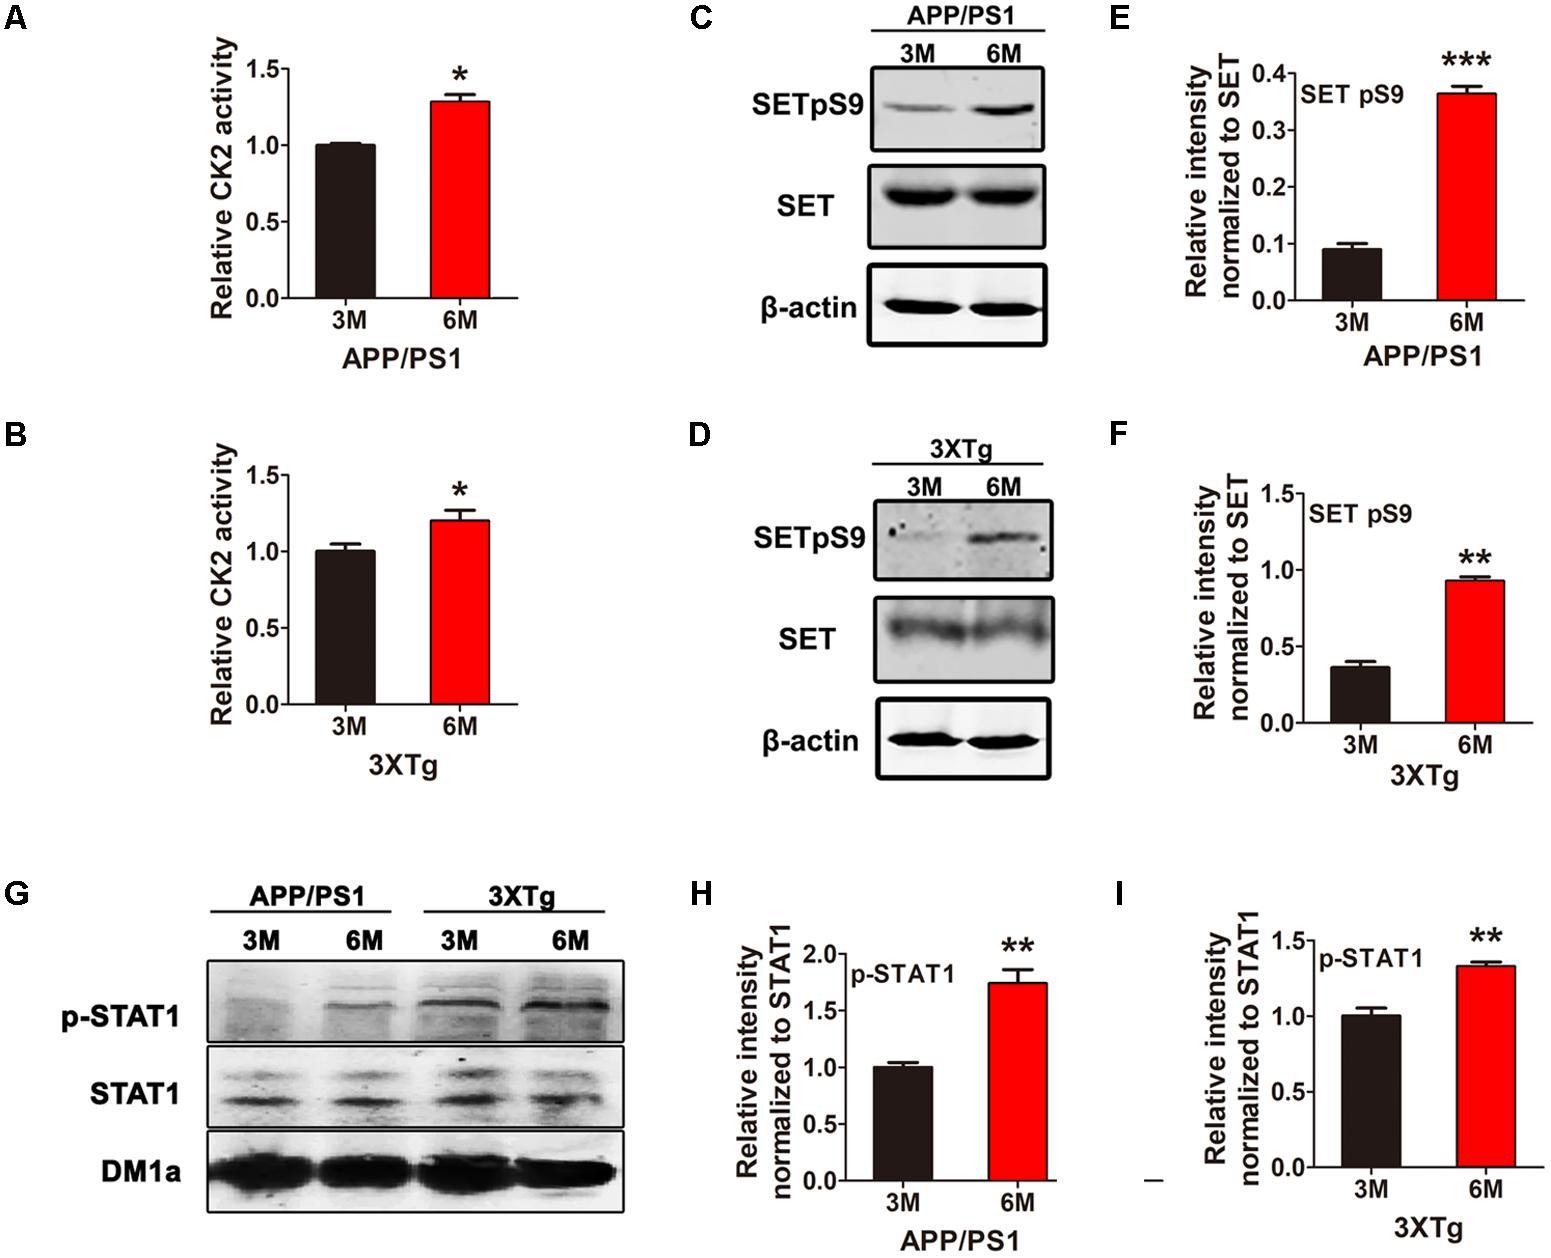 Frontiers | CK2 Phosphorylating I2PP2A/SET Mediates Tau Pathology